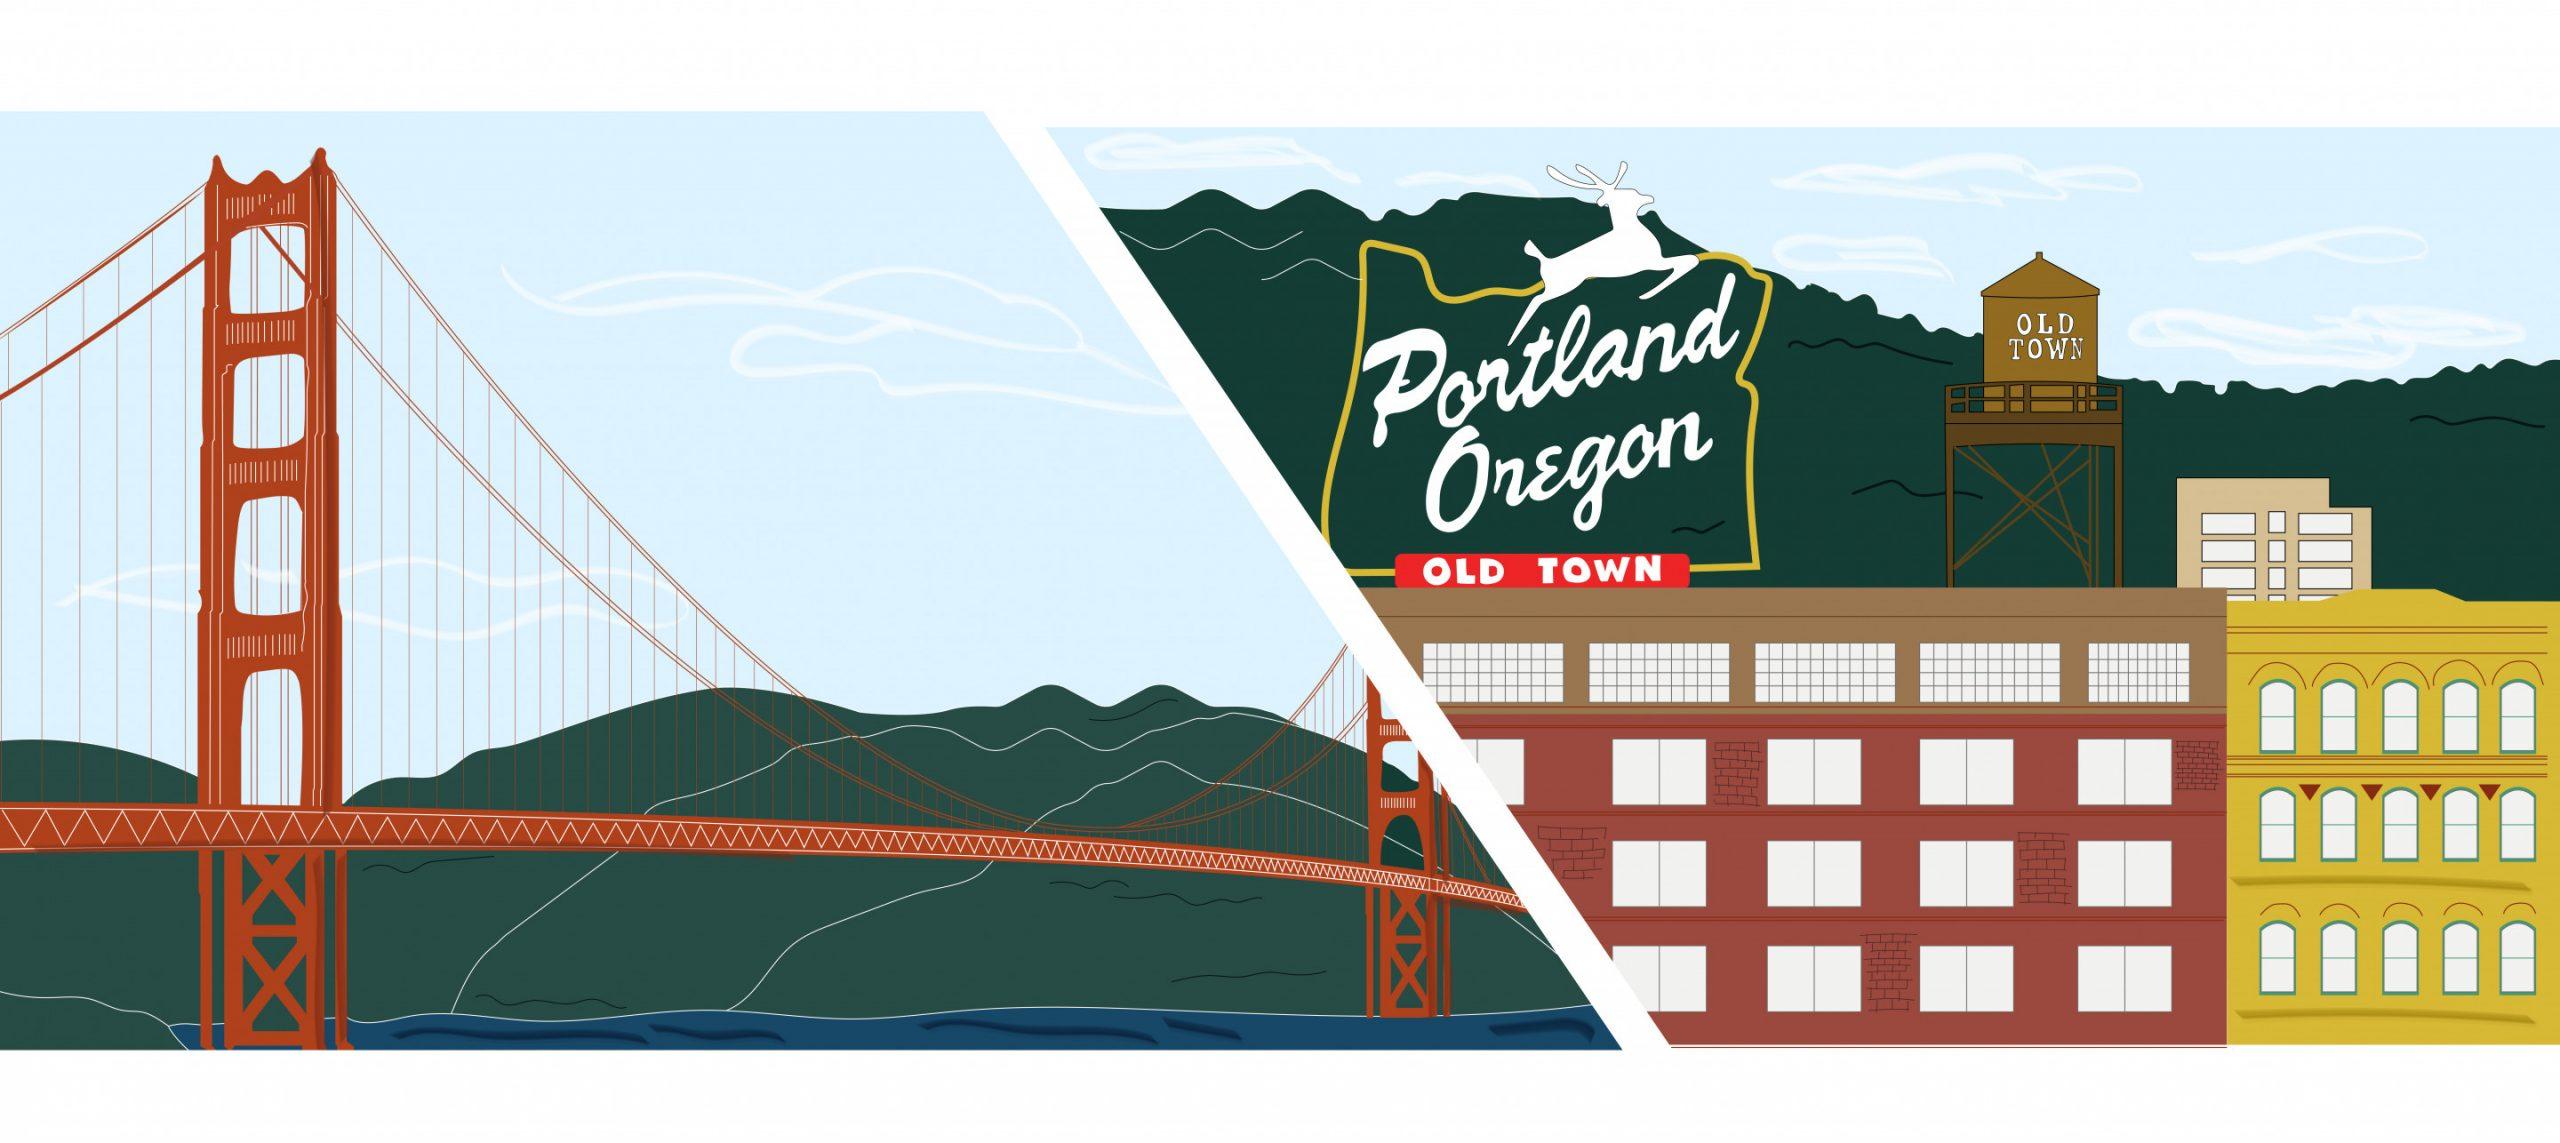 San Francisco And Portland